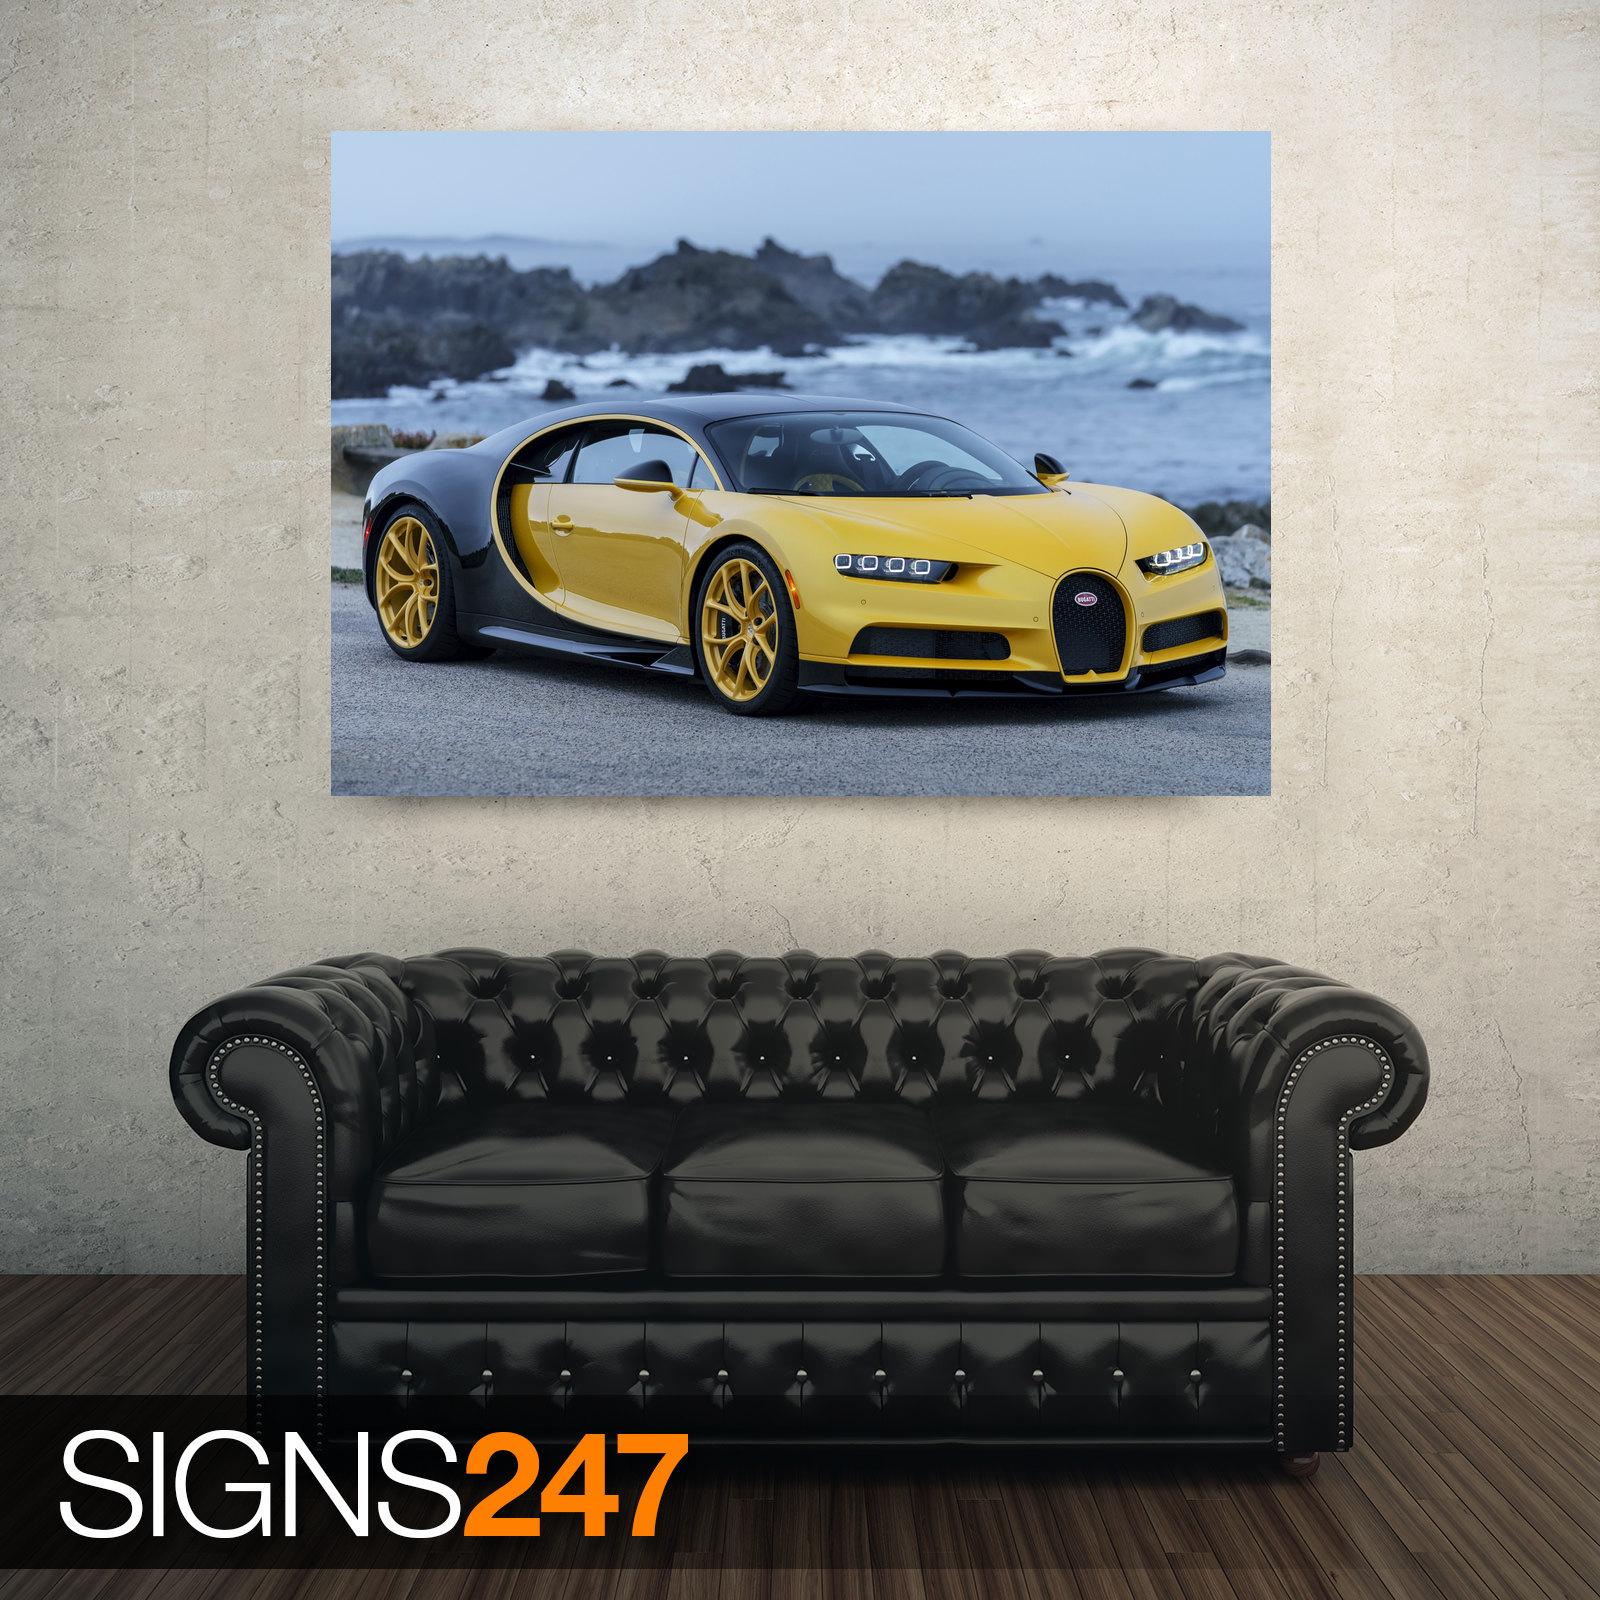 BUGATTI-CHIRON-2018-YELLOW-AD754-CAR-POSTER-Poster-Print-Art-A0-A1-A2-A3